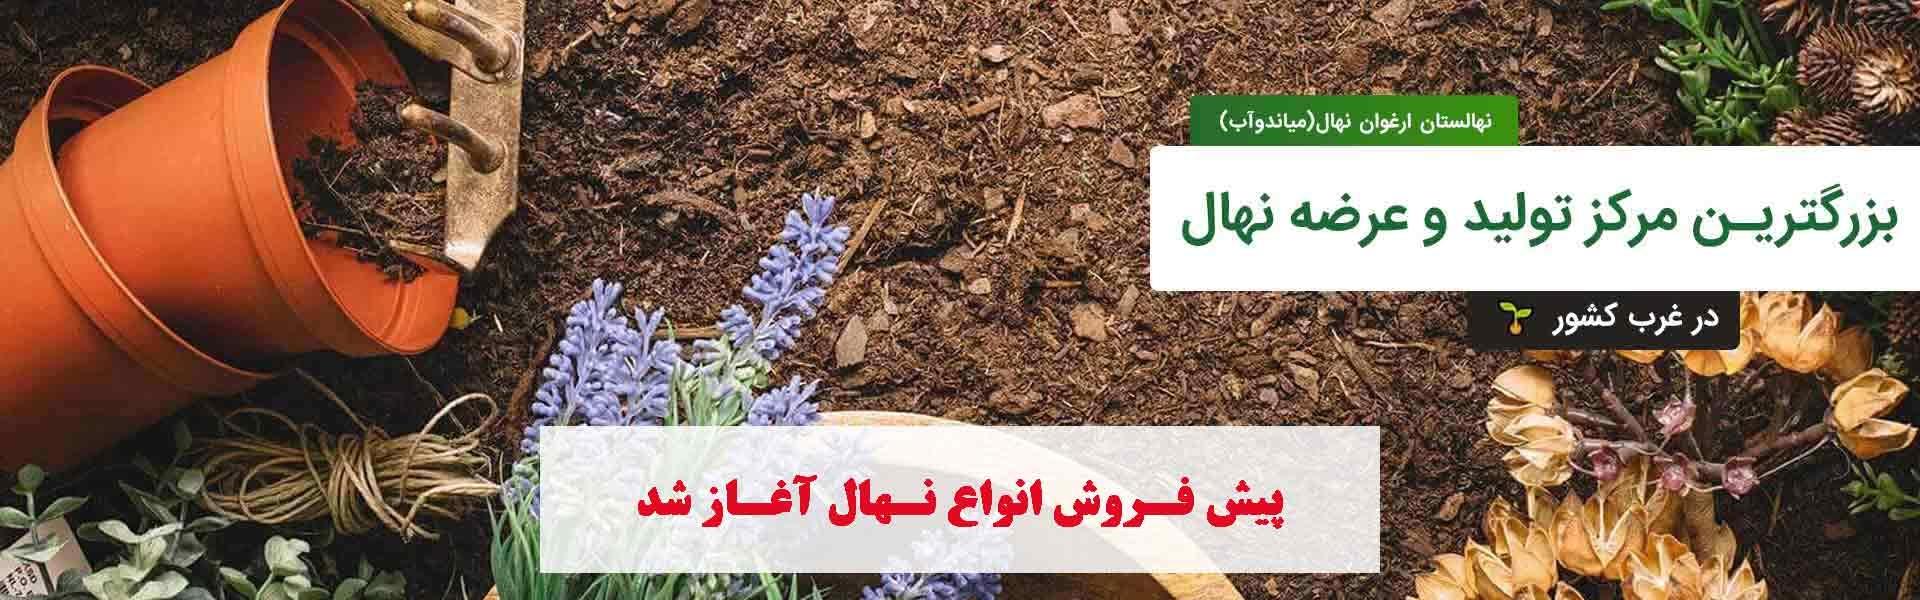 nahalargha (@nahalarghavan) Cover Image